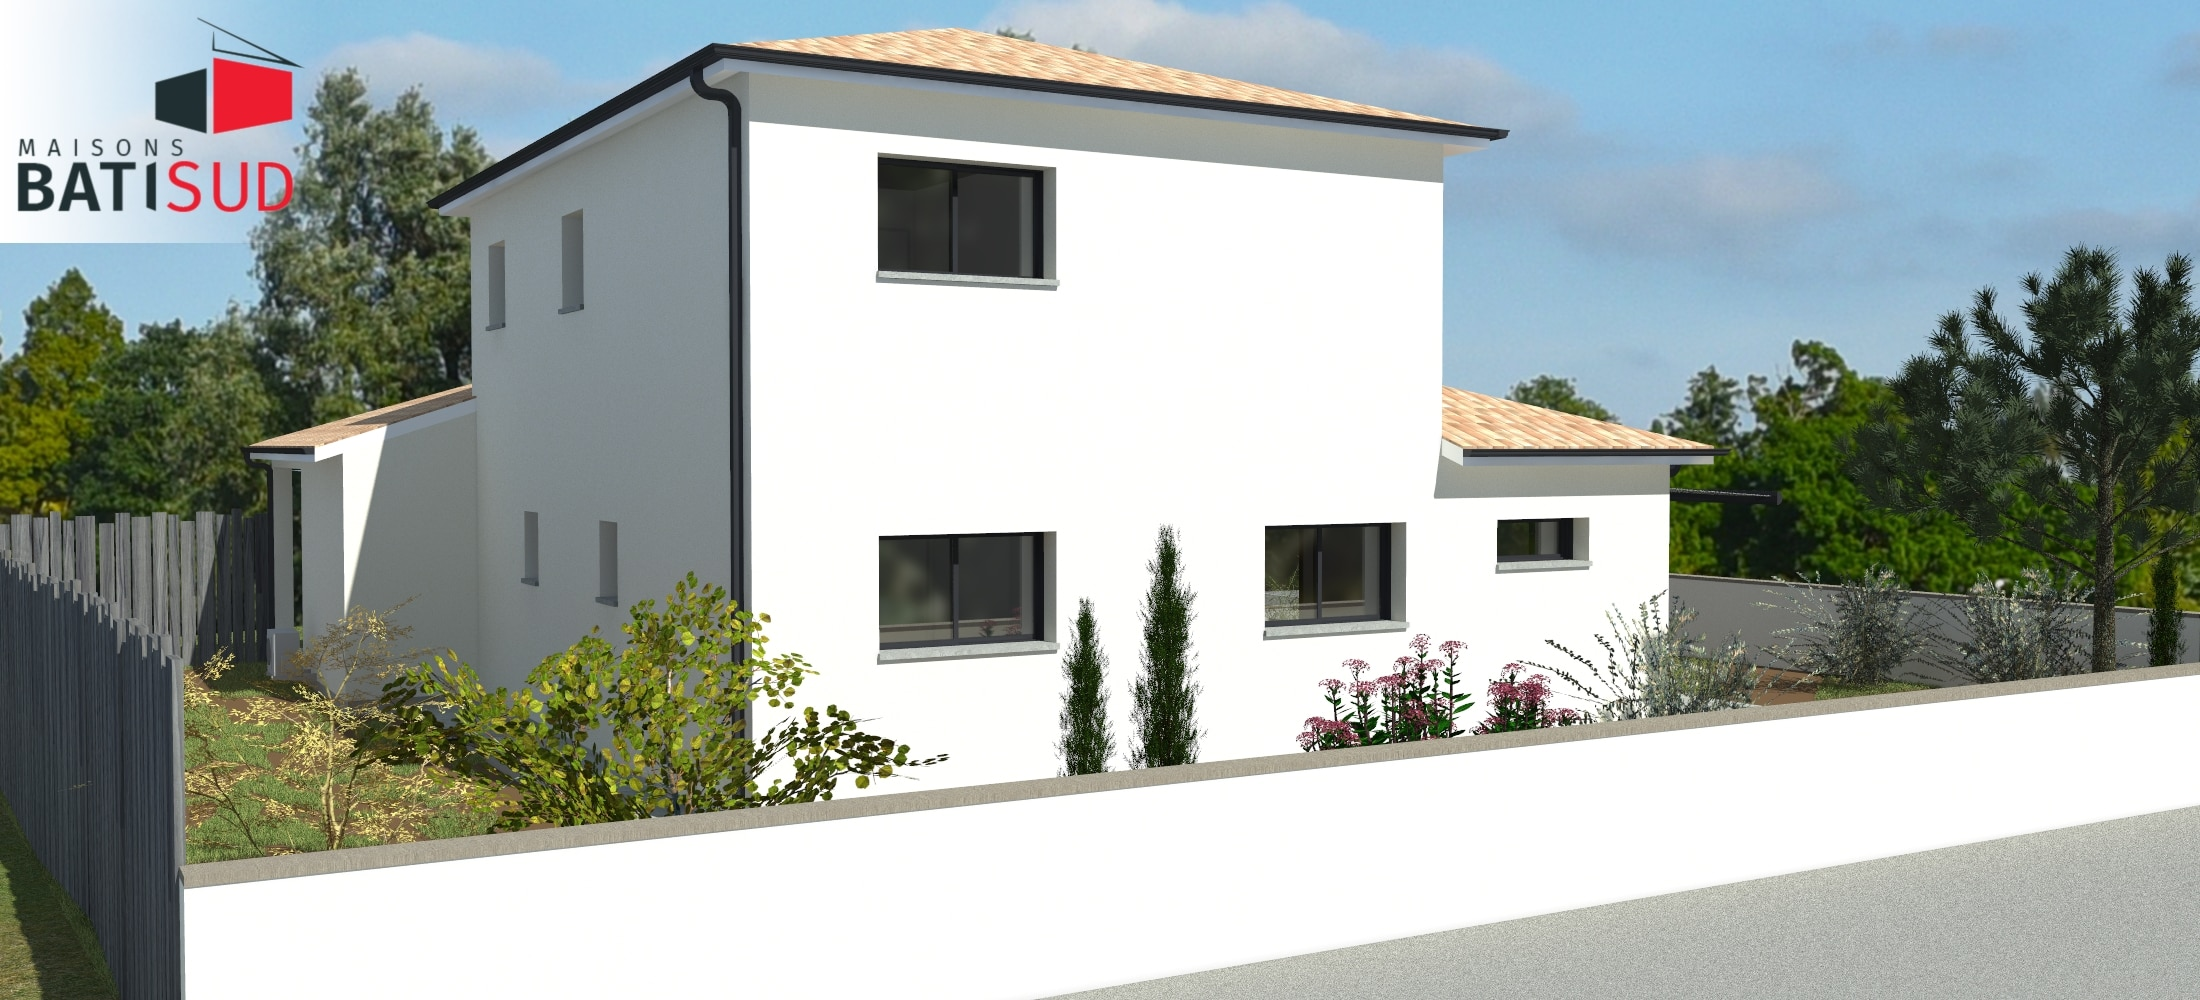 maison bati sud saint m dart construction 2 maisons bati sud. Black Bedroom Furniture Sets. Home Design Ideas